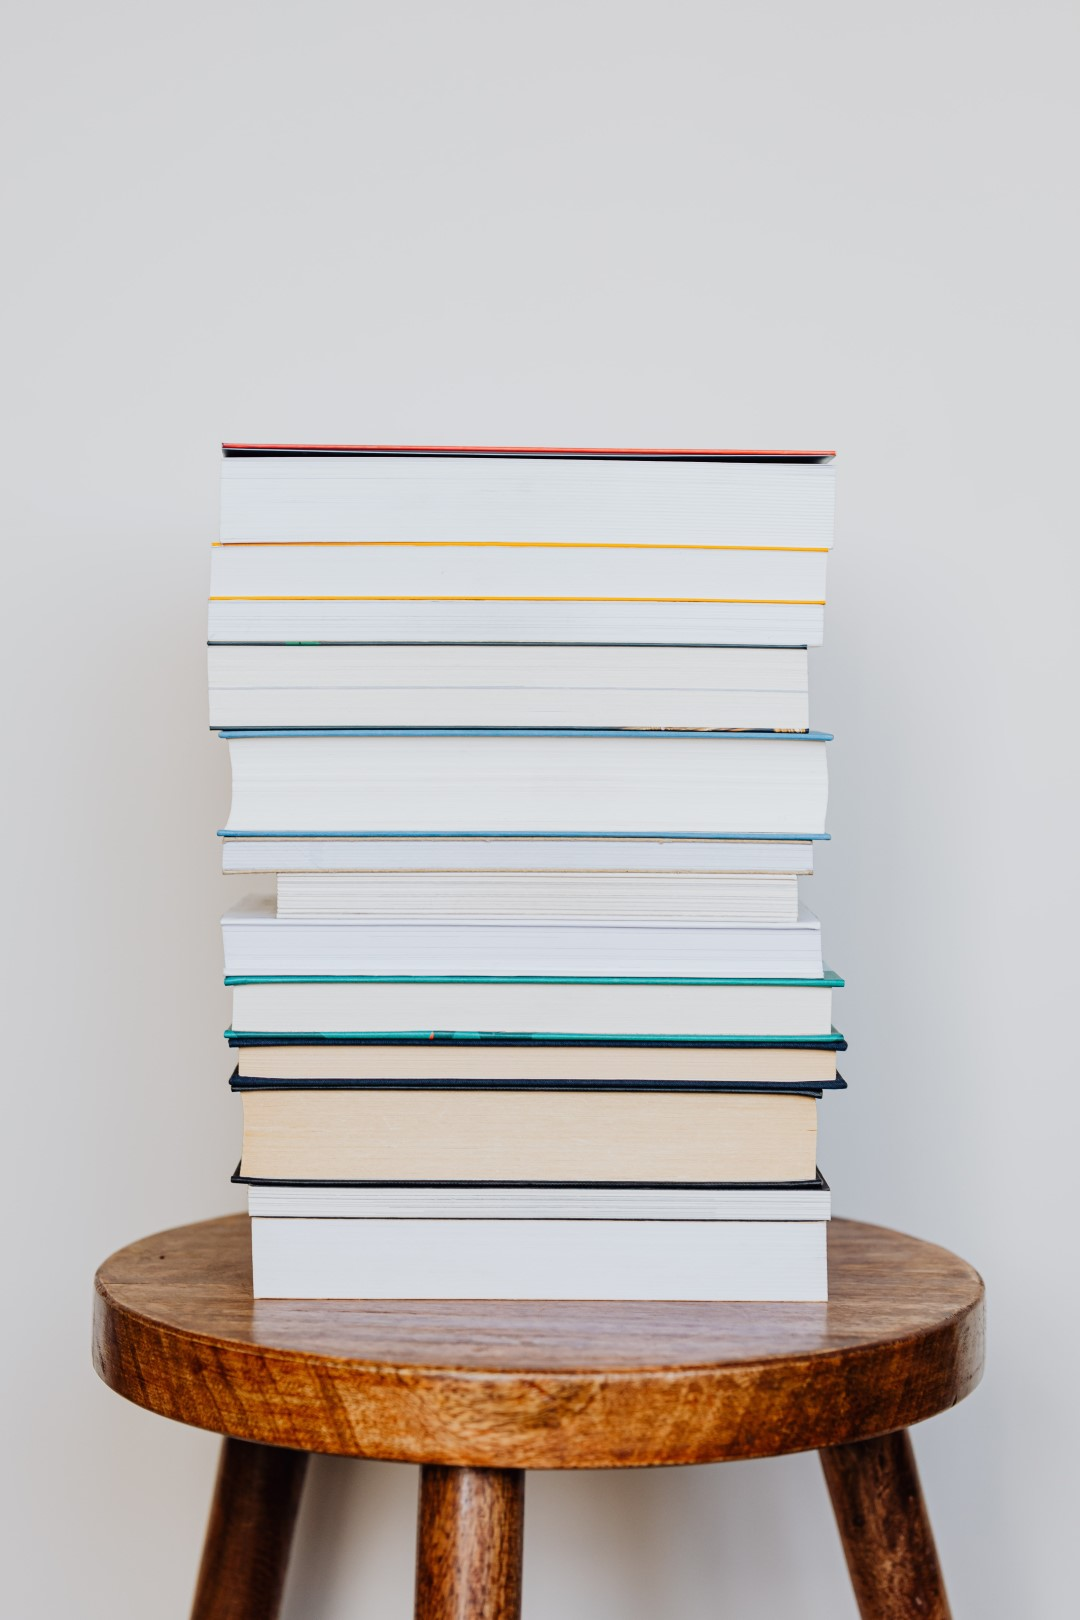 libros de pastelería, libros de cocina, recetas de cocina, recomendación libros de cocina.